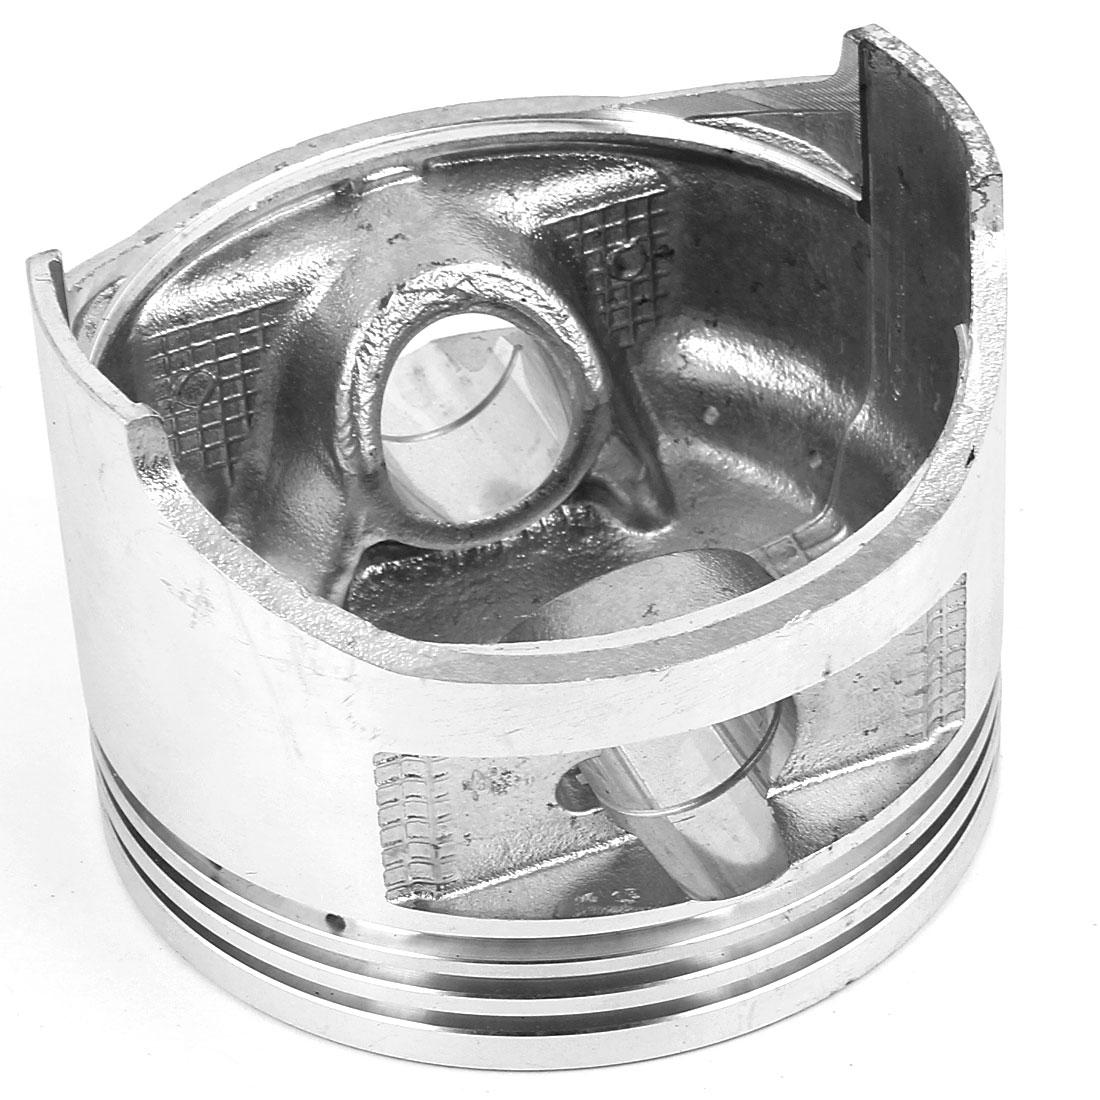 90mm Dia Silver Tone C190 Air Compressor Generator Mower Engine Motor Piston